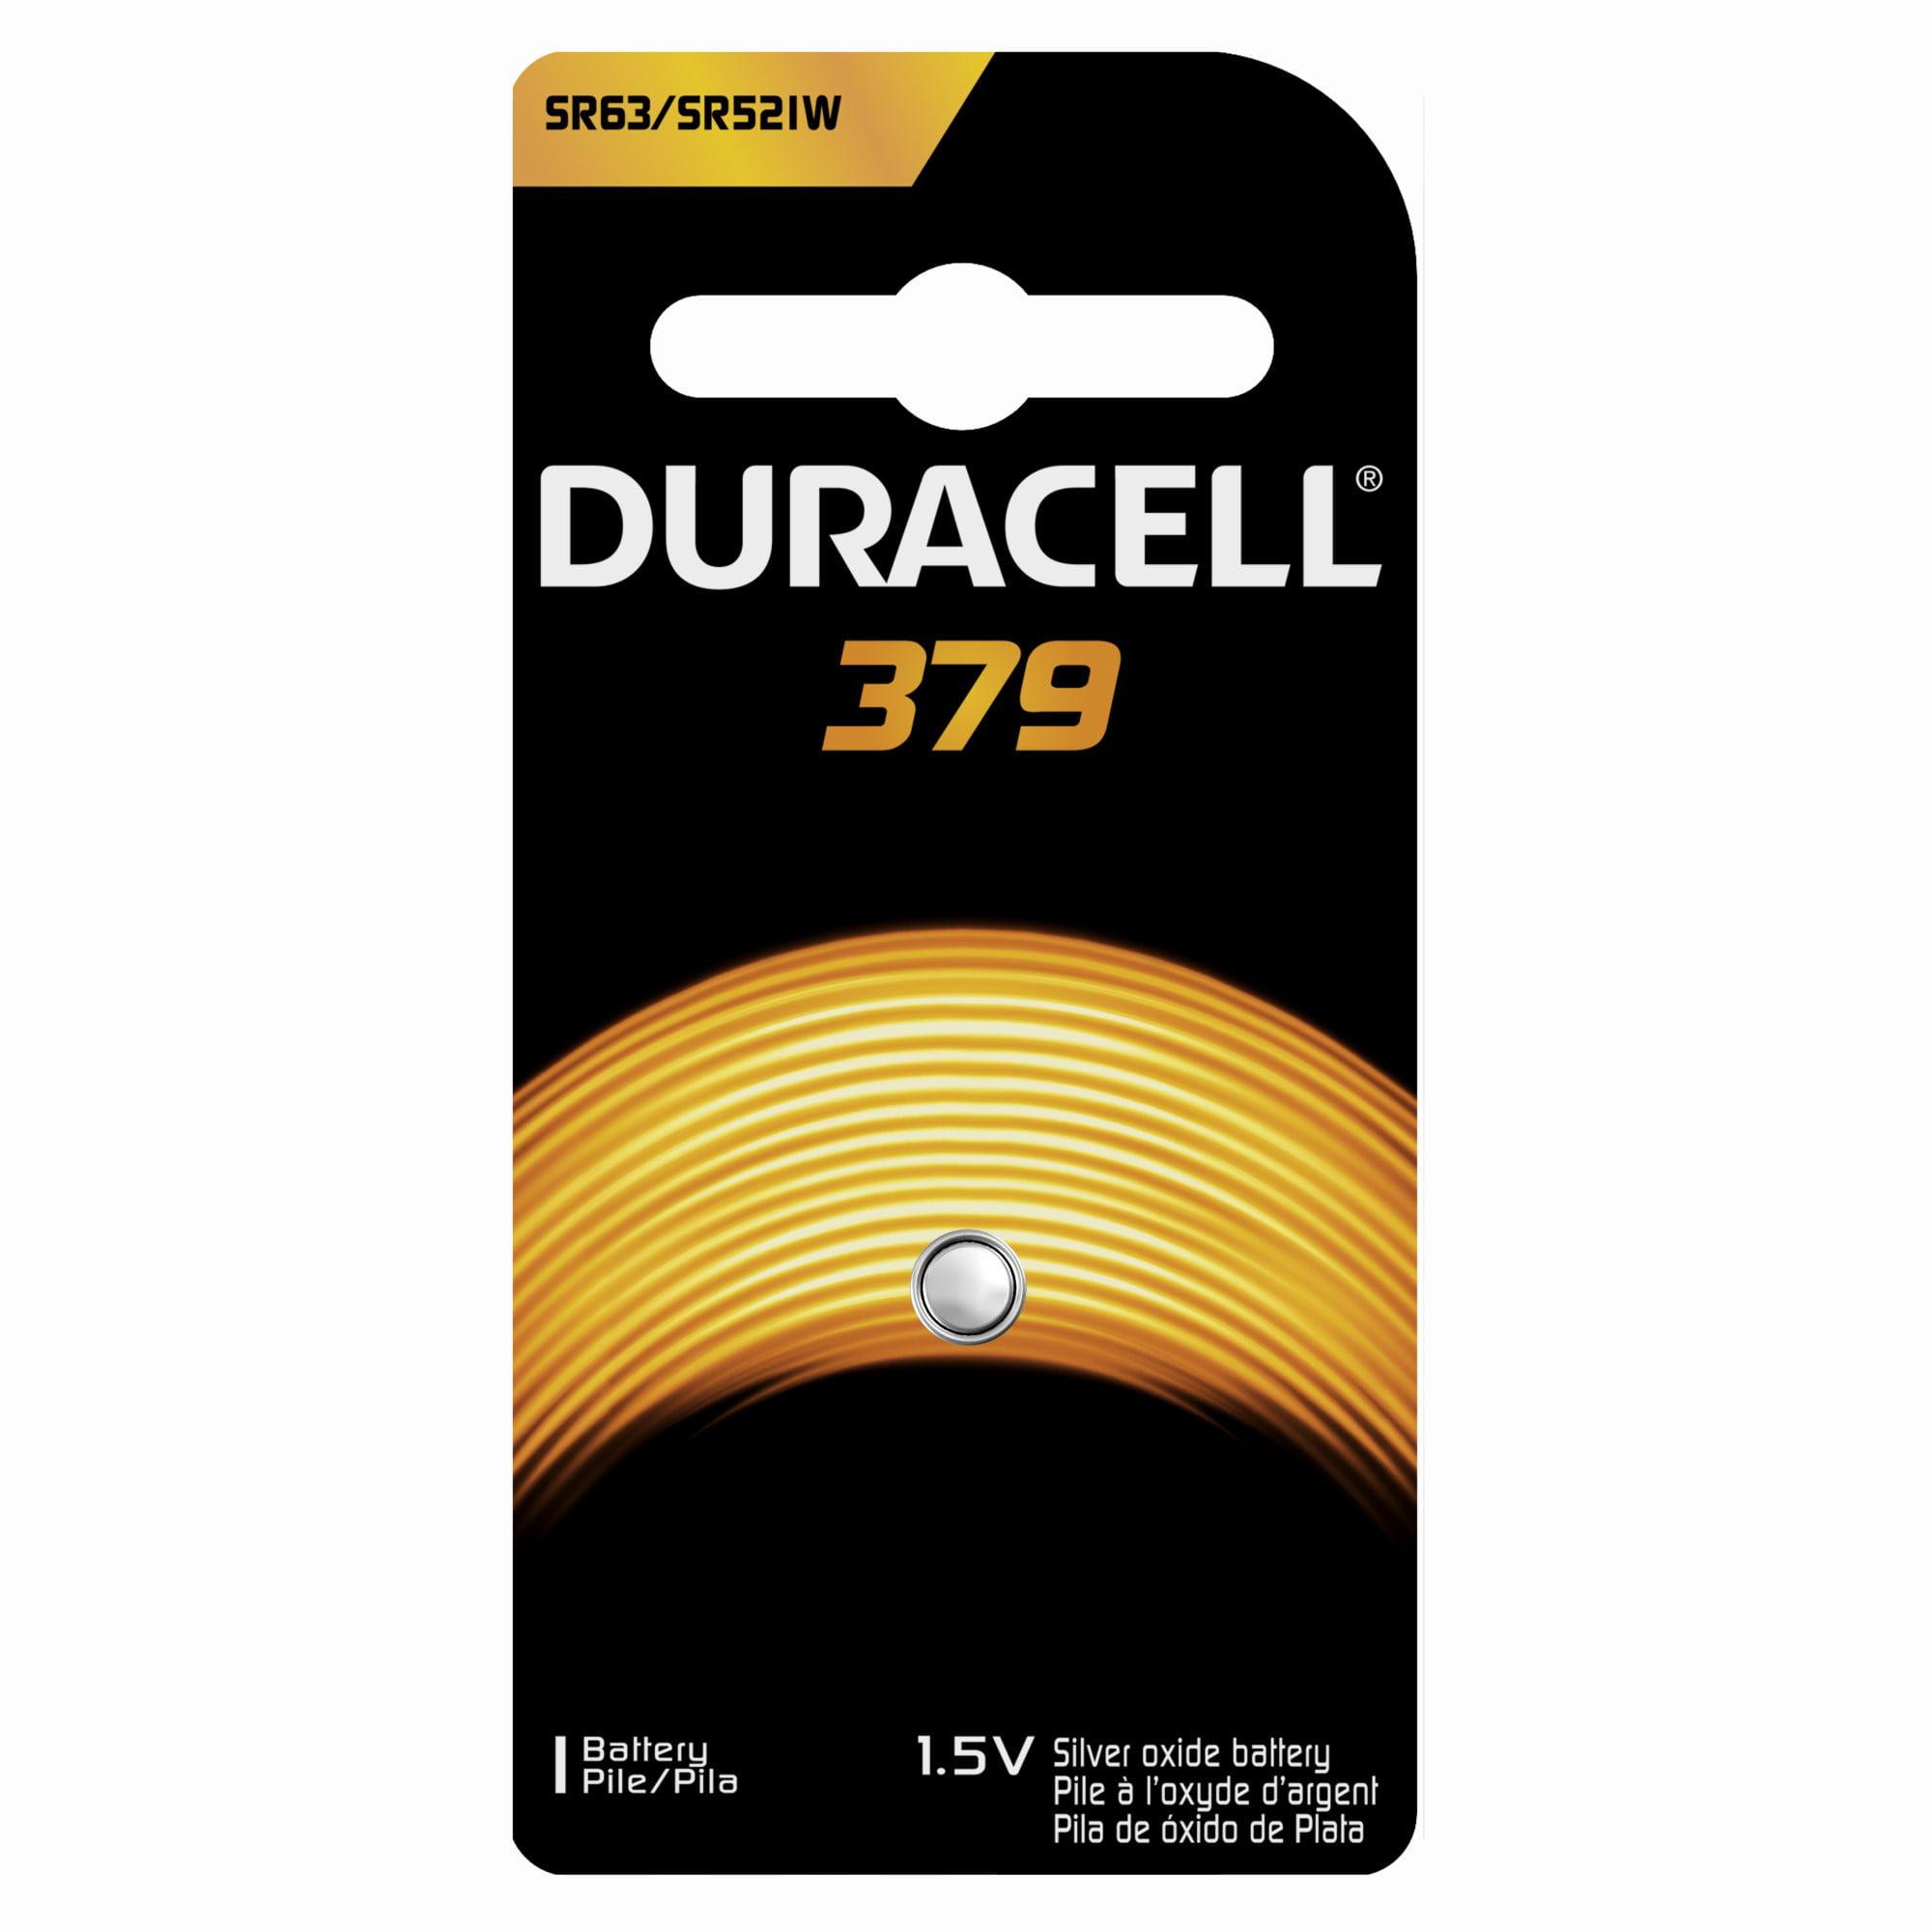 Duracell Silver Oxide Button 379